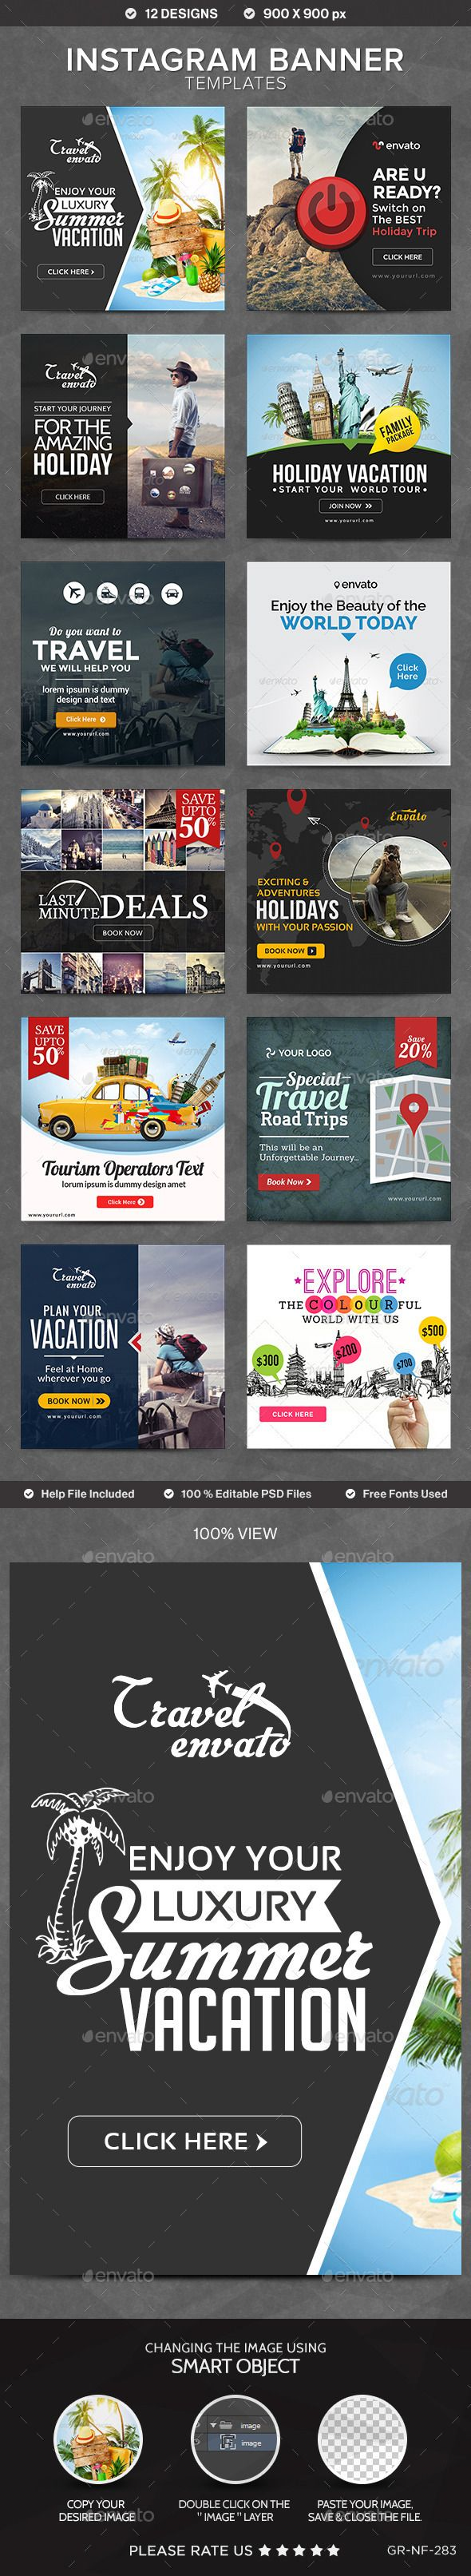 Instagram Banner Templates - 12 Designs on Behance